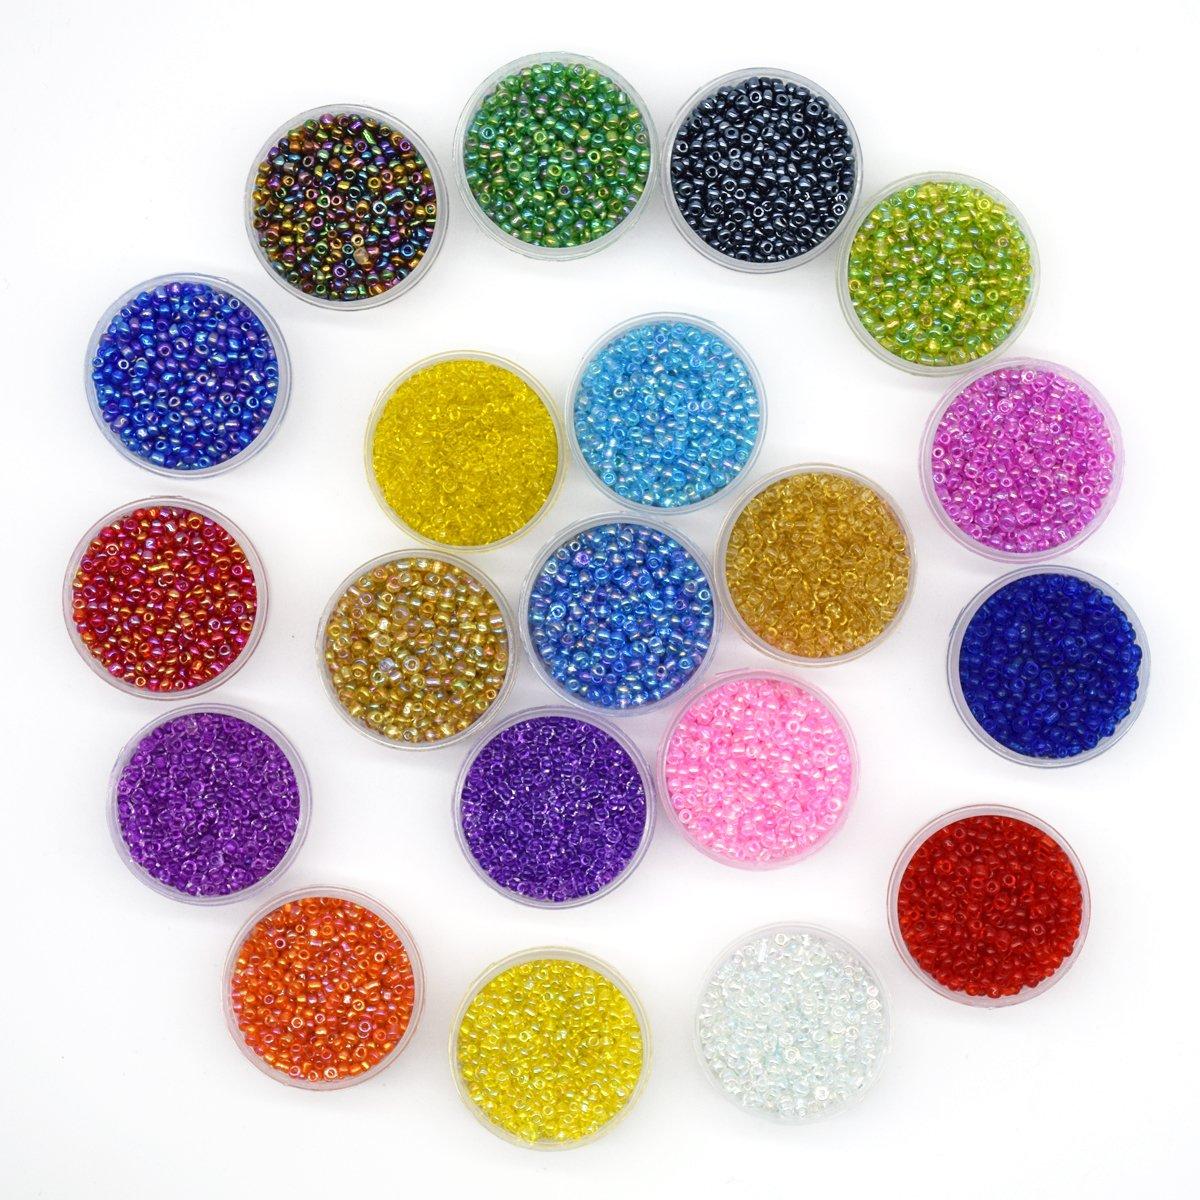 Yuekui Multicolore Perles de verre, perles, 2mm de perles en verre ronde à Propos de 16000pcs 20couleurs avec 0,6mm de diamètre 10metres de long DIY Perles Line.